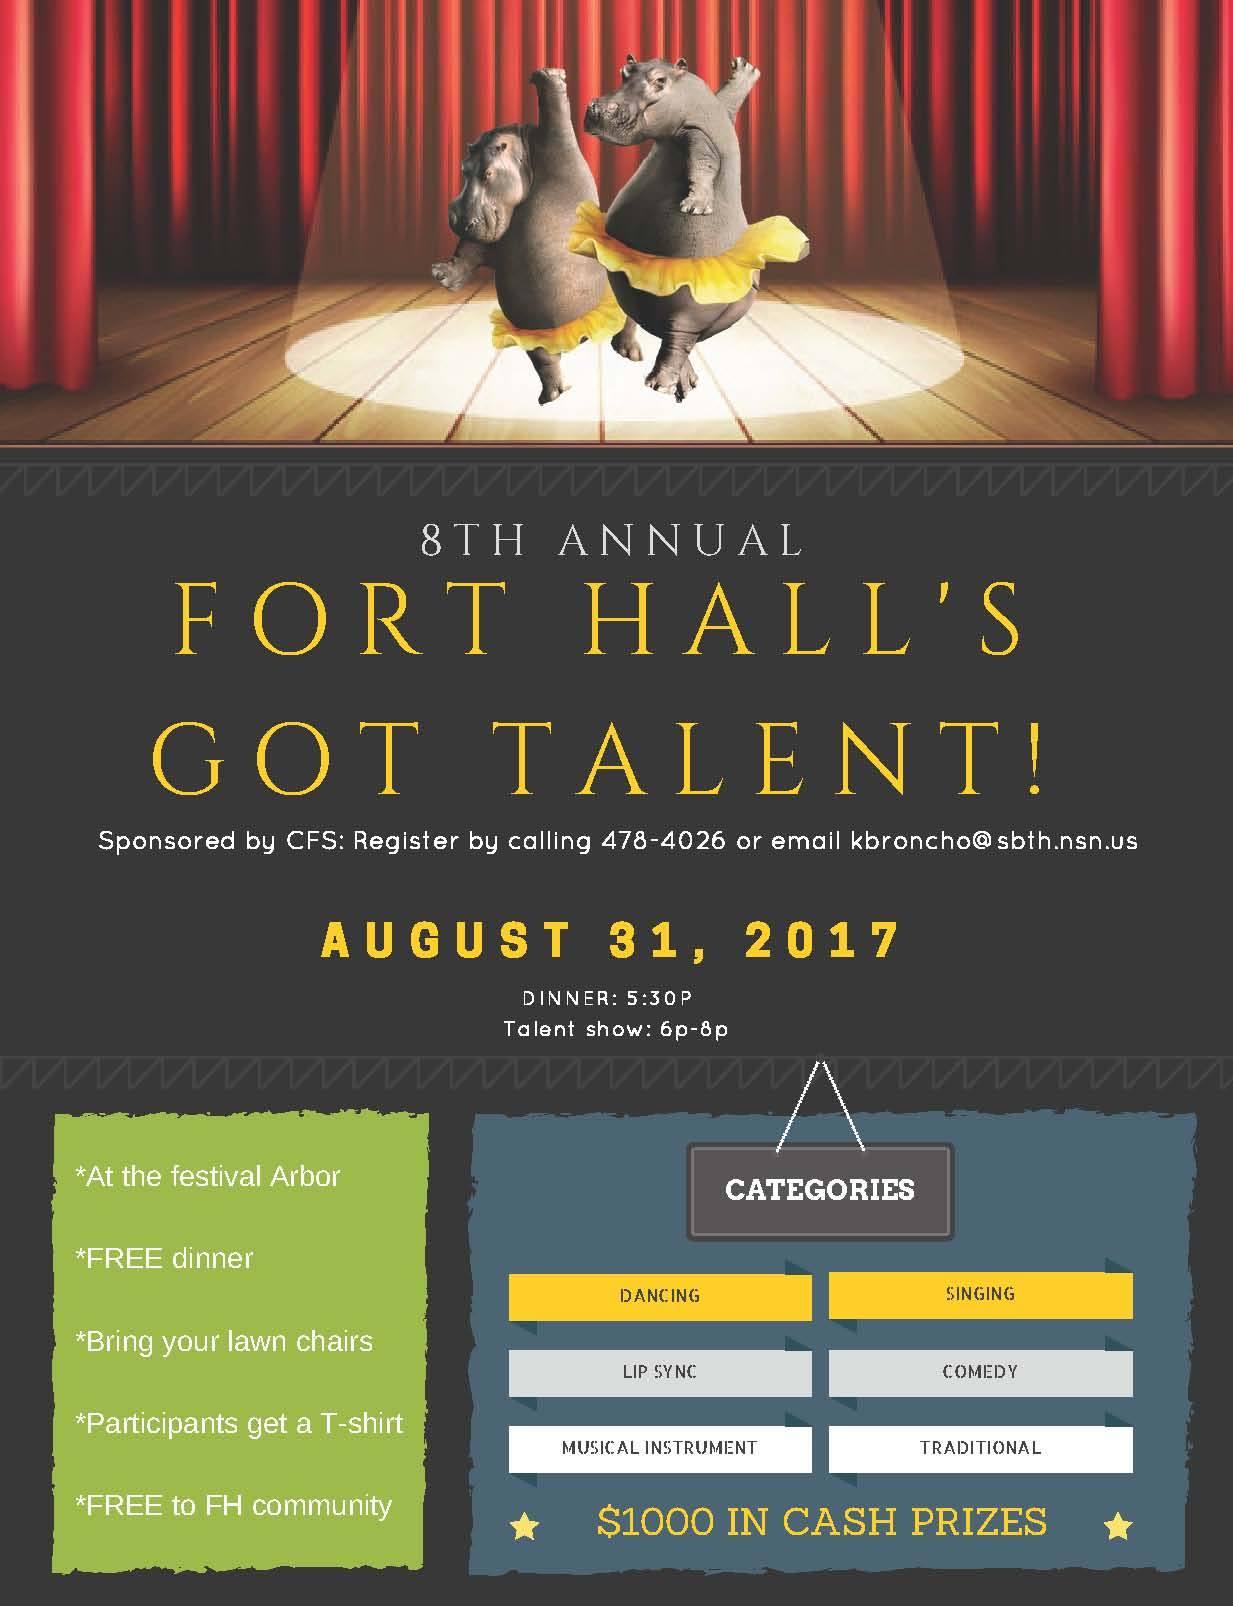 Fort Halls Got Talent 2017